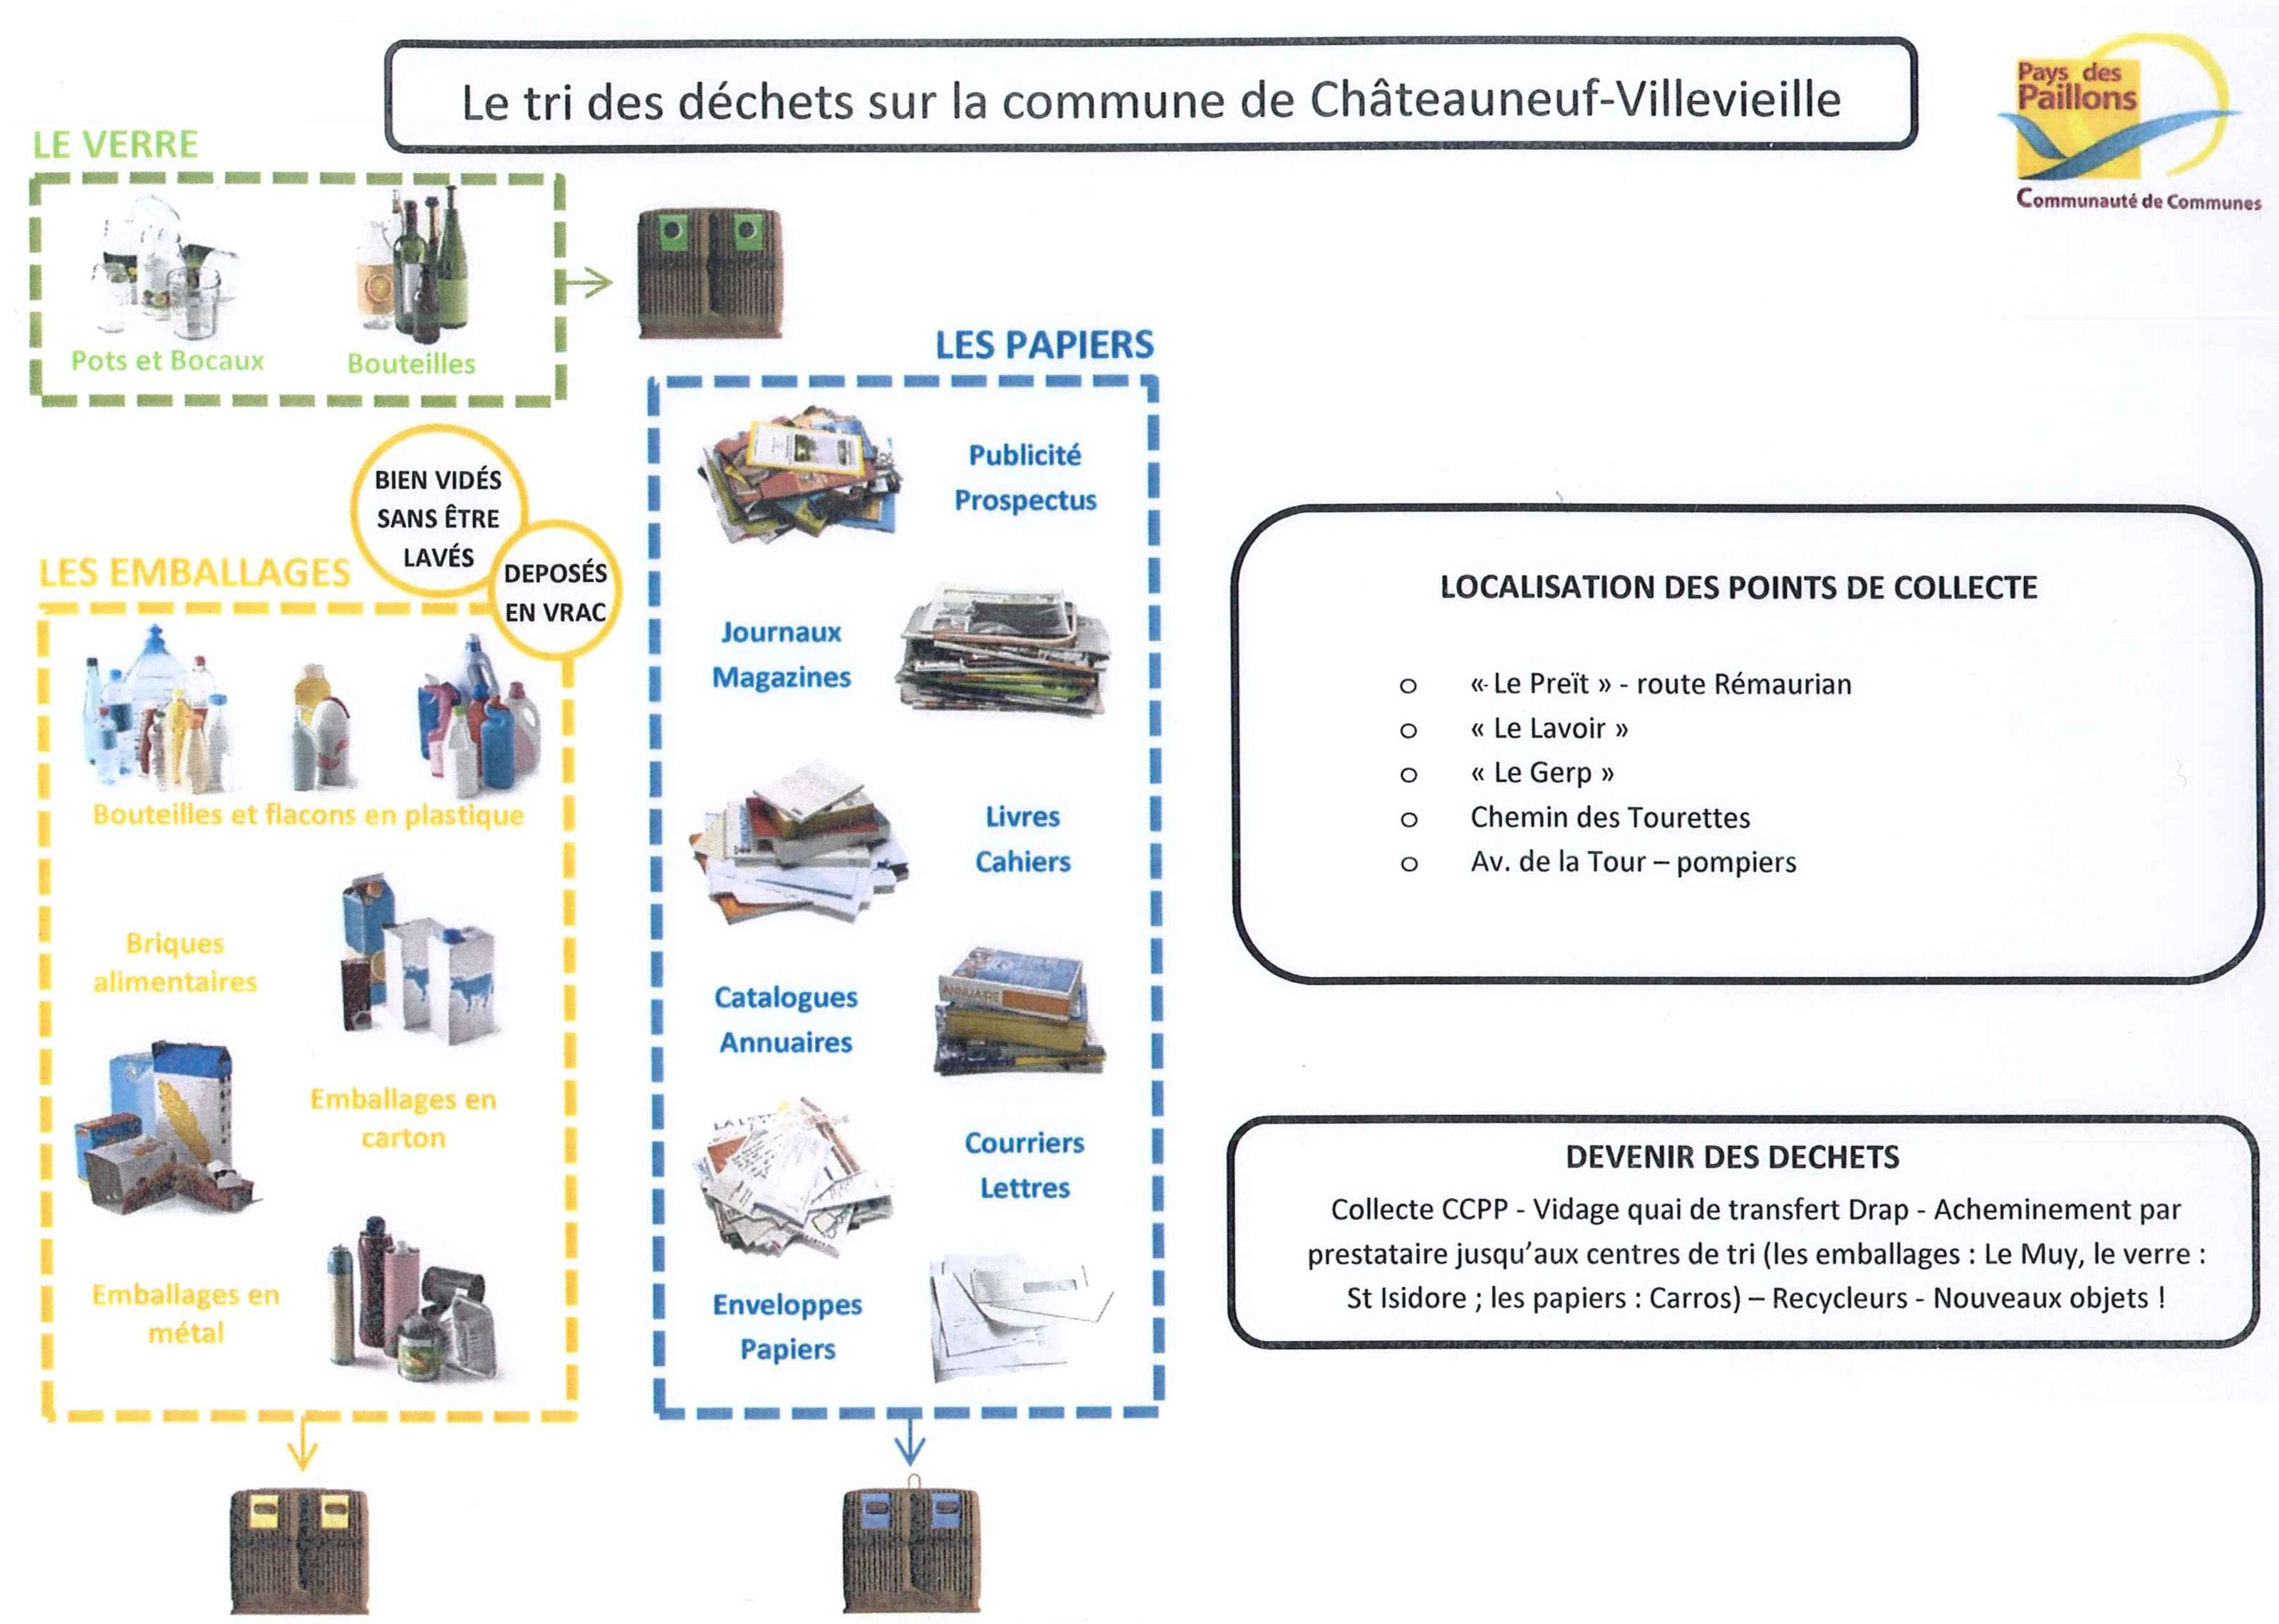 tri-chateauneuf-villevieille